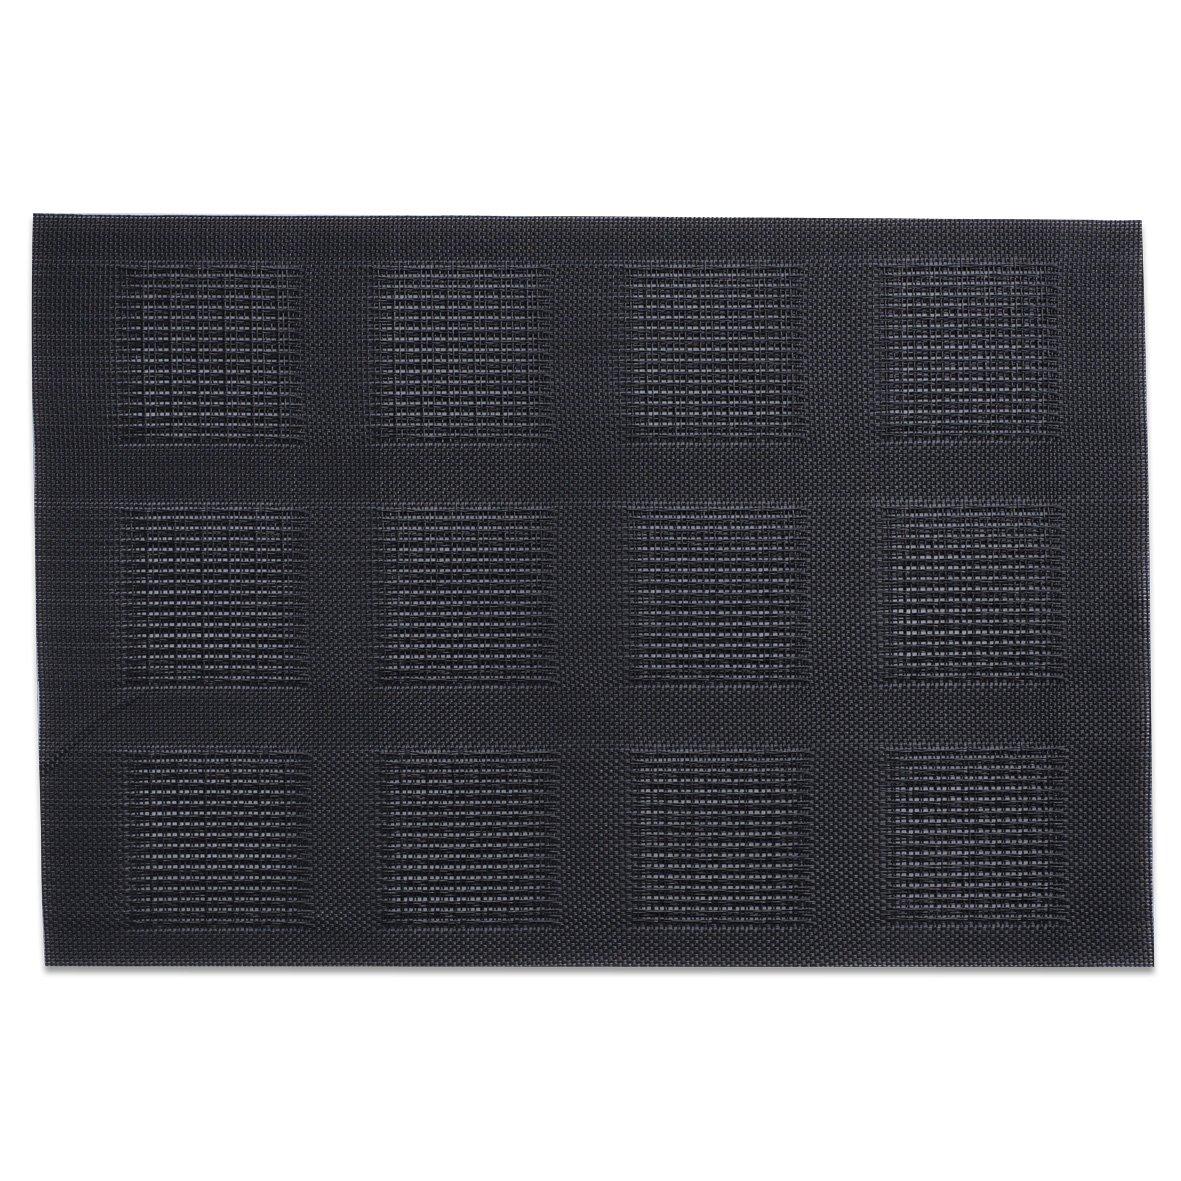 Zeller 26721 - Juego de 4 manteles individuales, PVC, 45 x 30 cm, color: Negro 99312